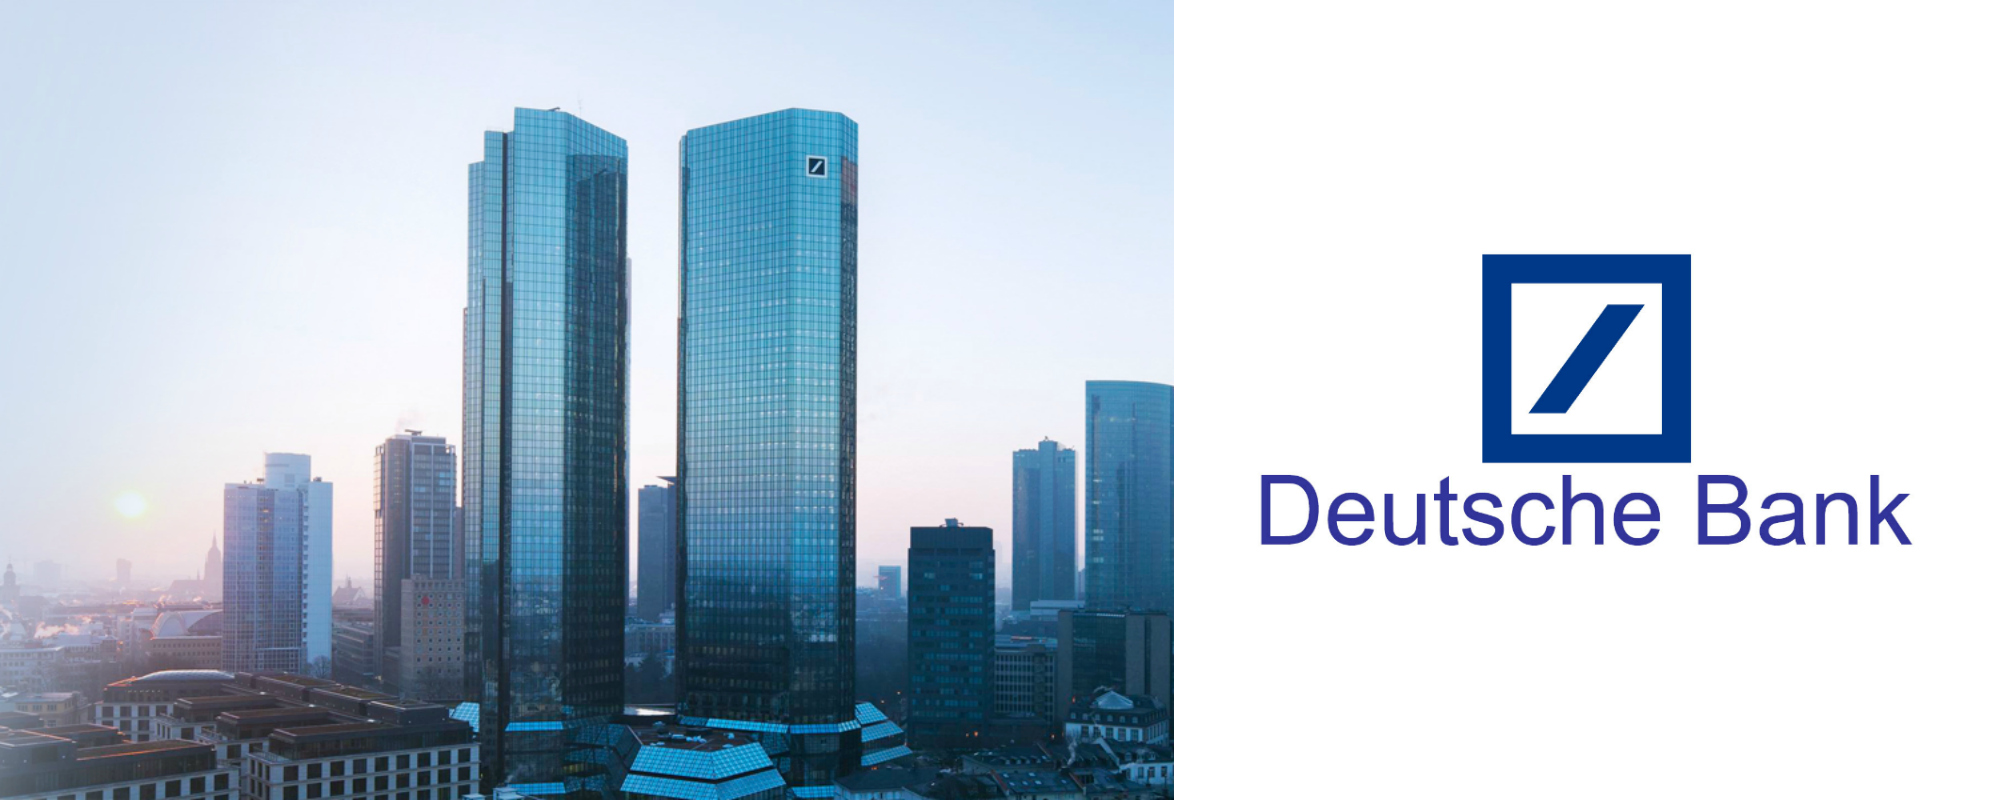 deutsche-bank-logo Most Powerful M&A Firms in the world best upslide